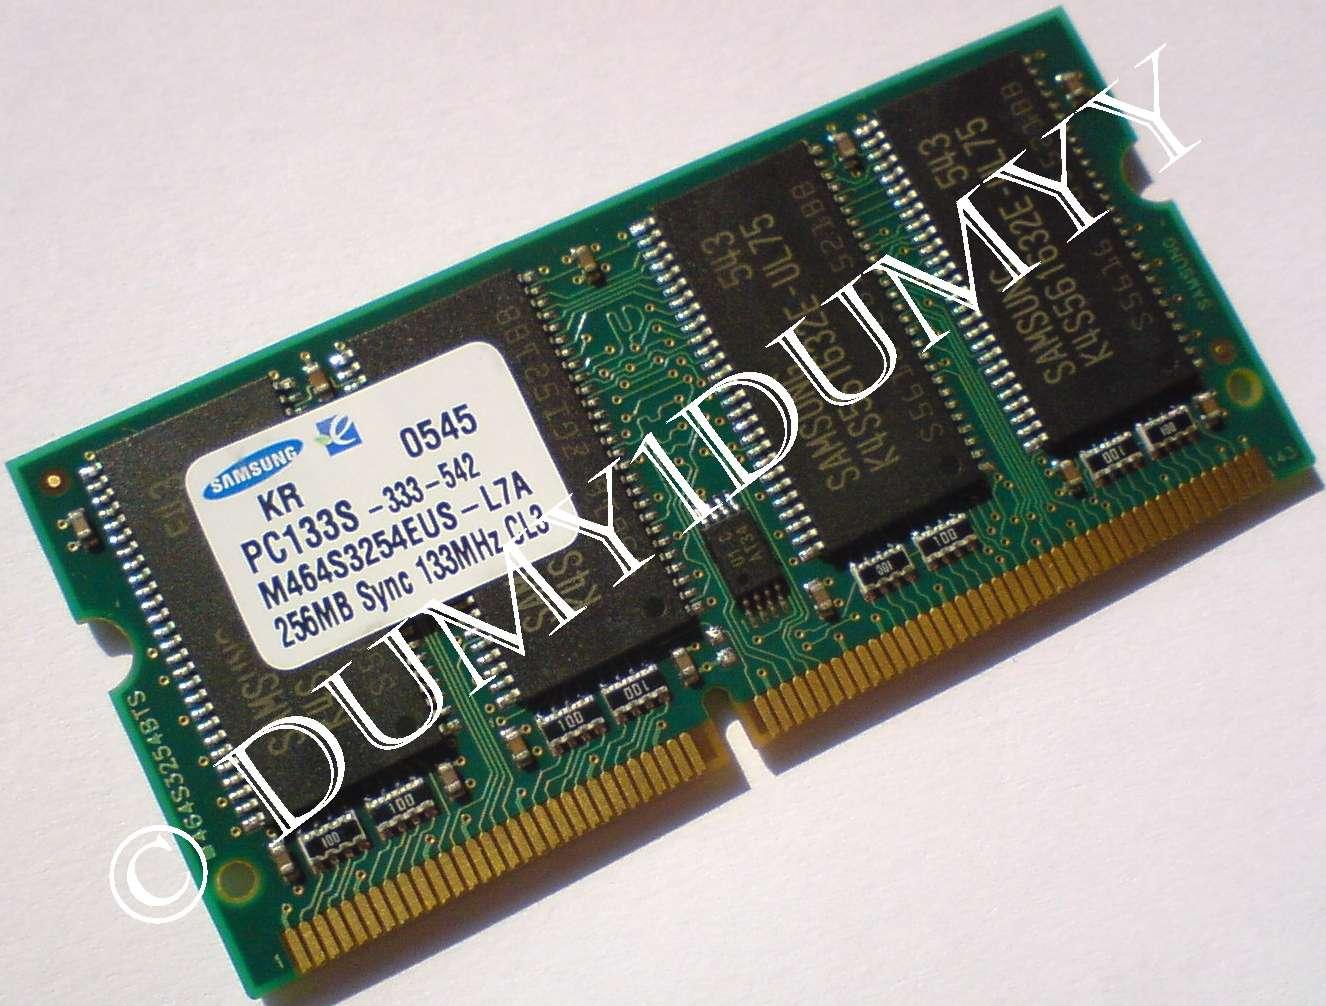 2X256MB DDR2 MEMORY RAM PC2-6400 SODIMM 200-PIN 512MB